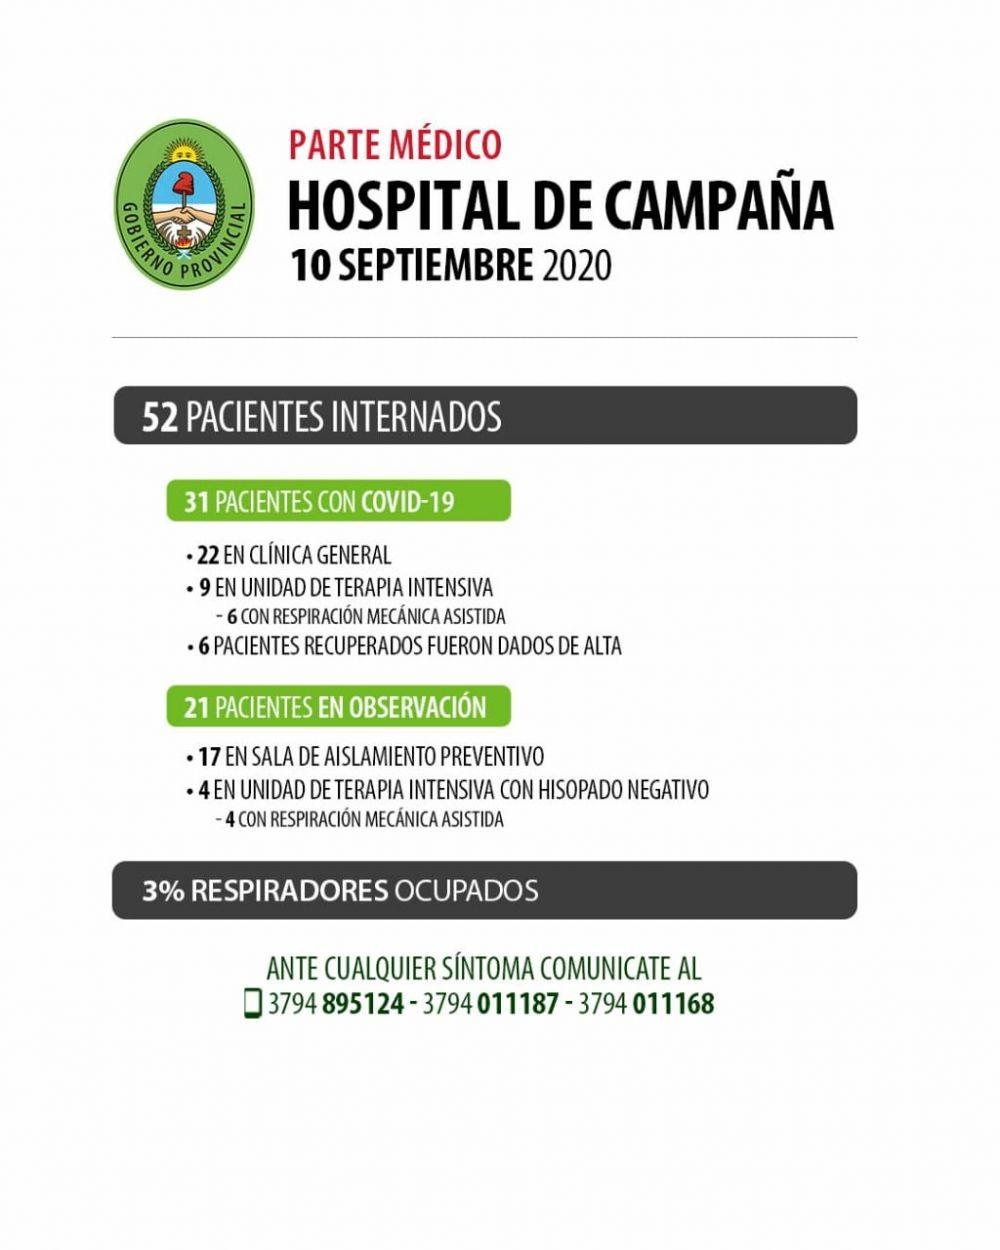 Coronavirus en Corrientes: Hay seis personas internadas con respirador